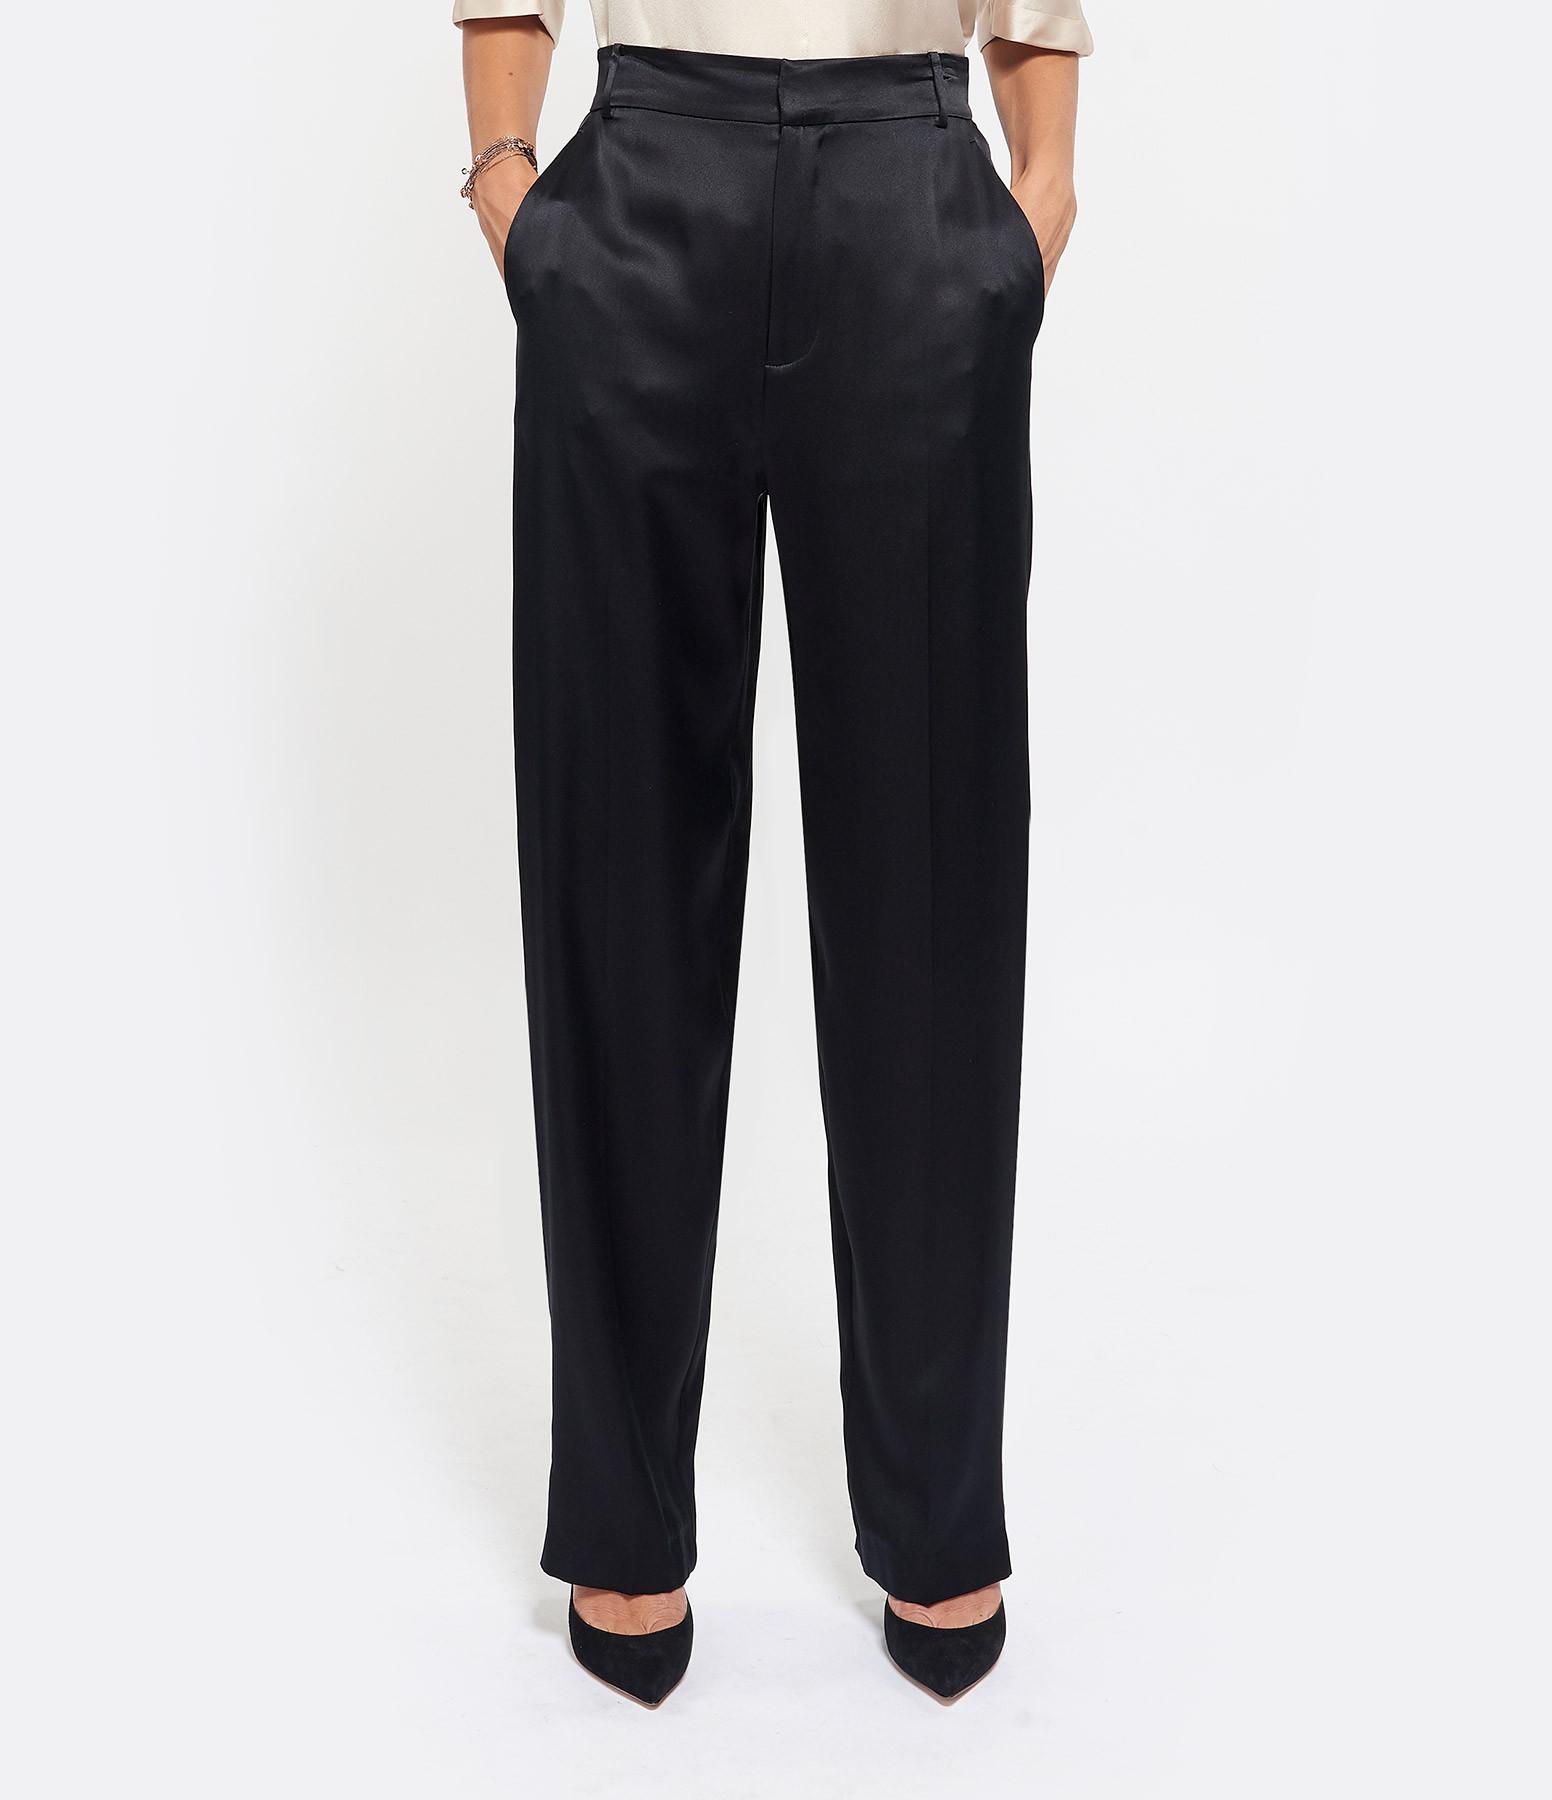 JOSEPH - Pantalon Jack Soie Noir